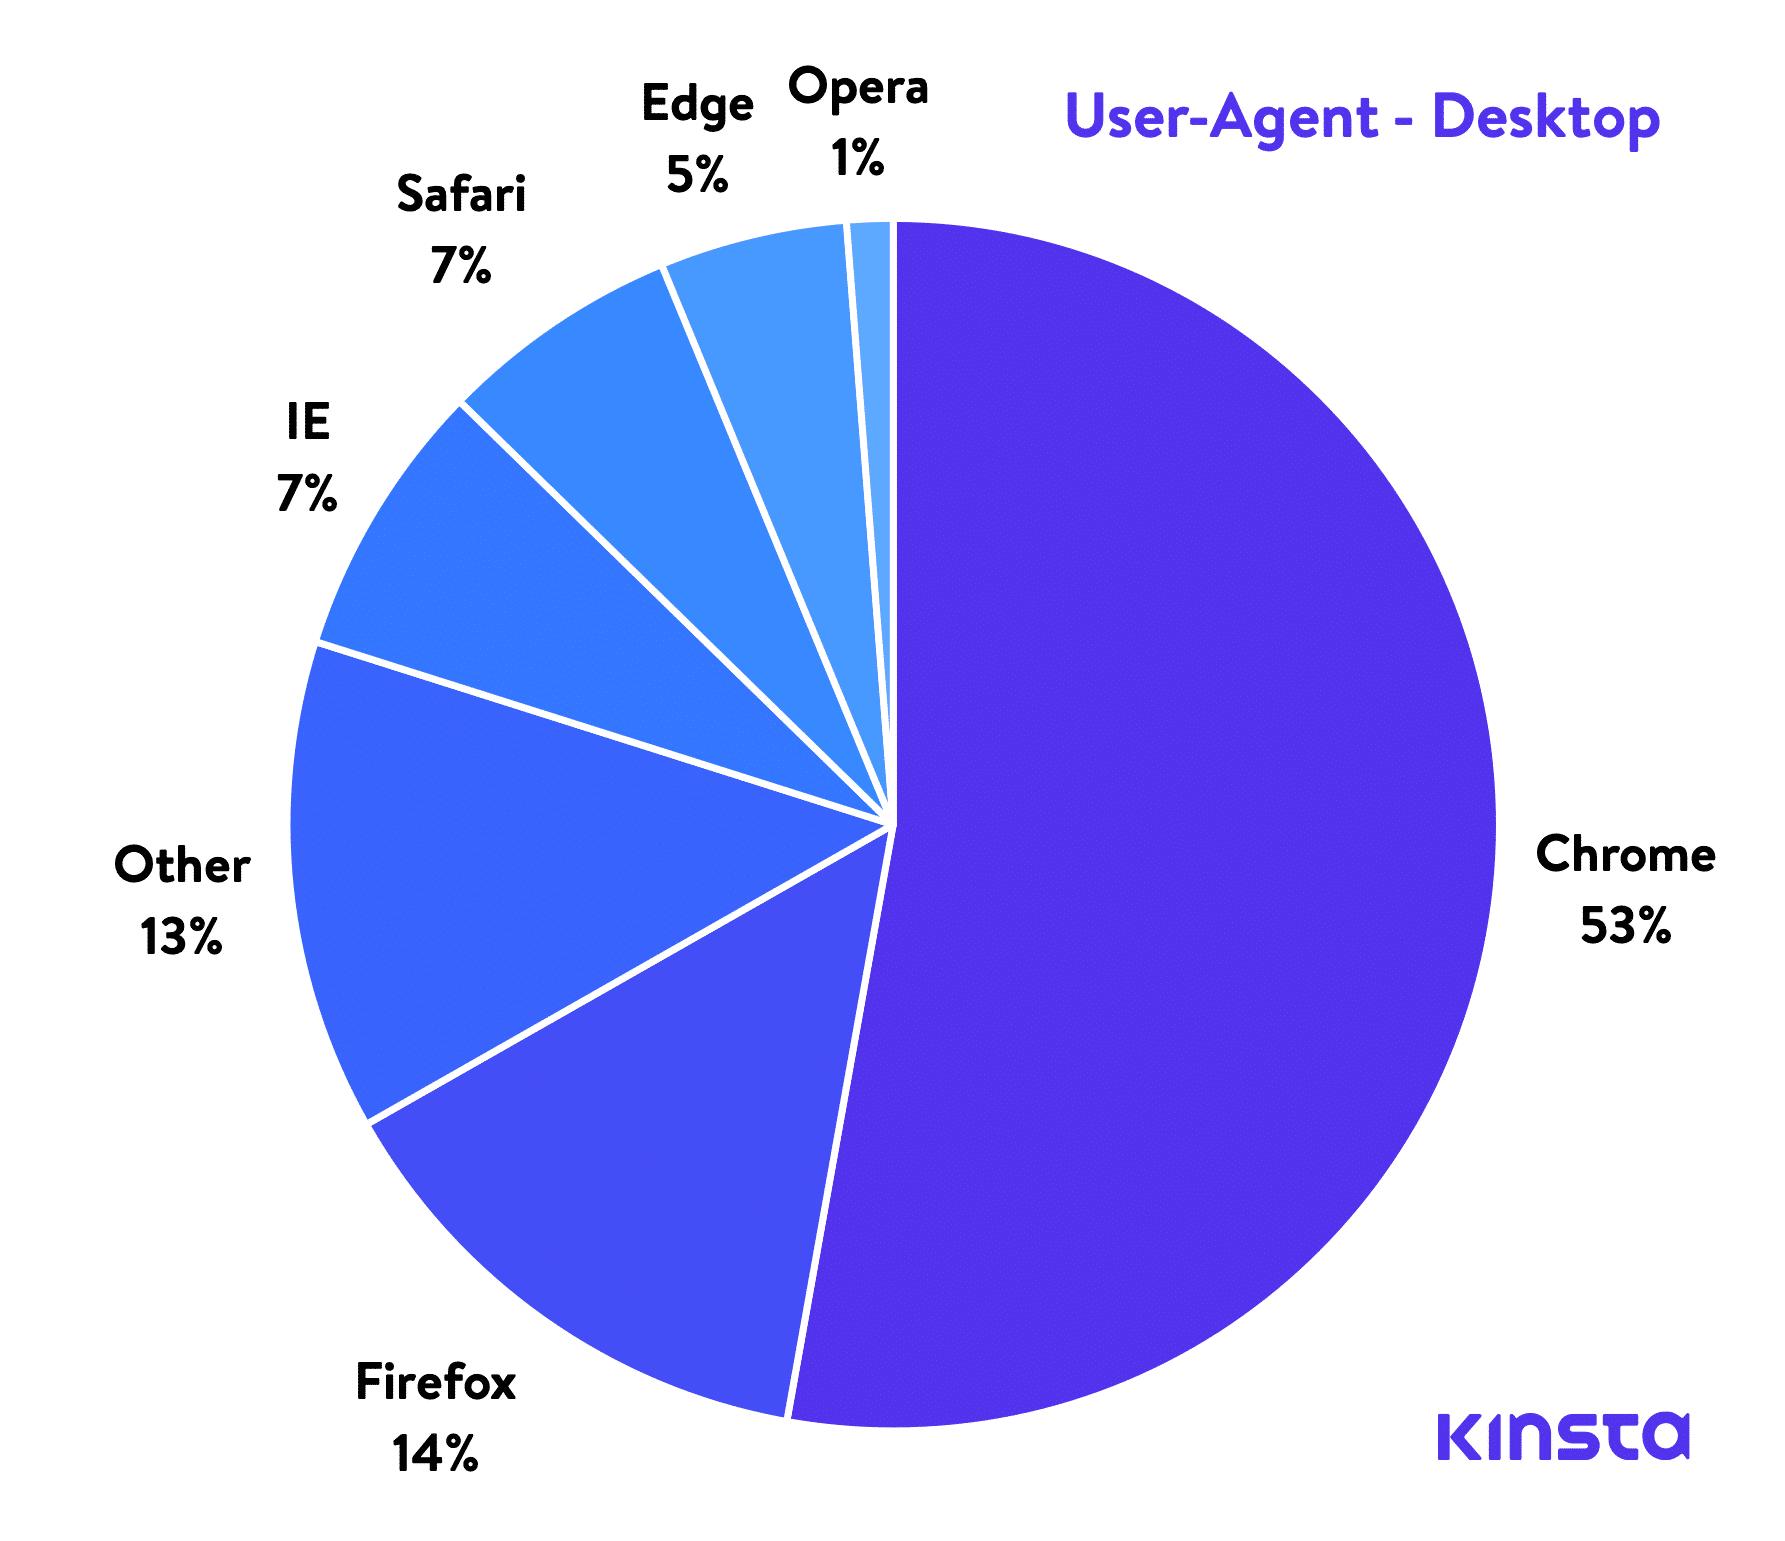 User-agent en computadora de escritorio